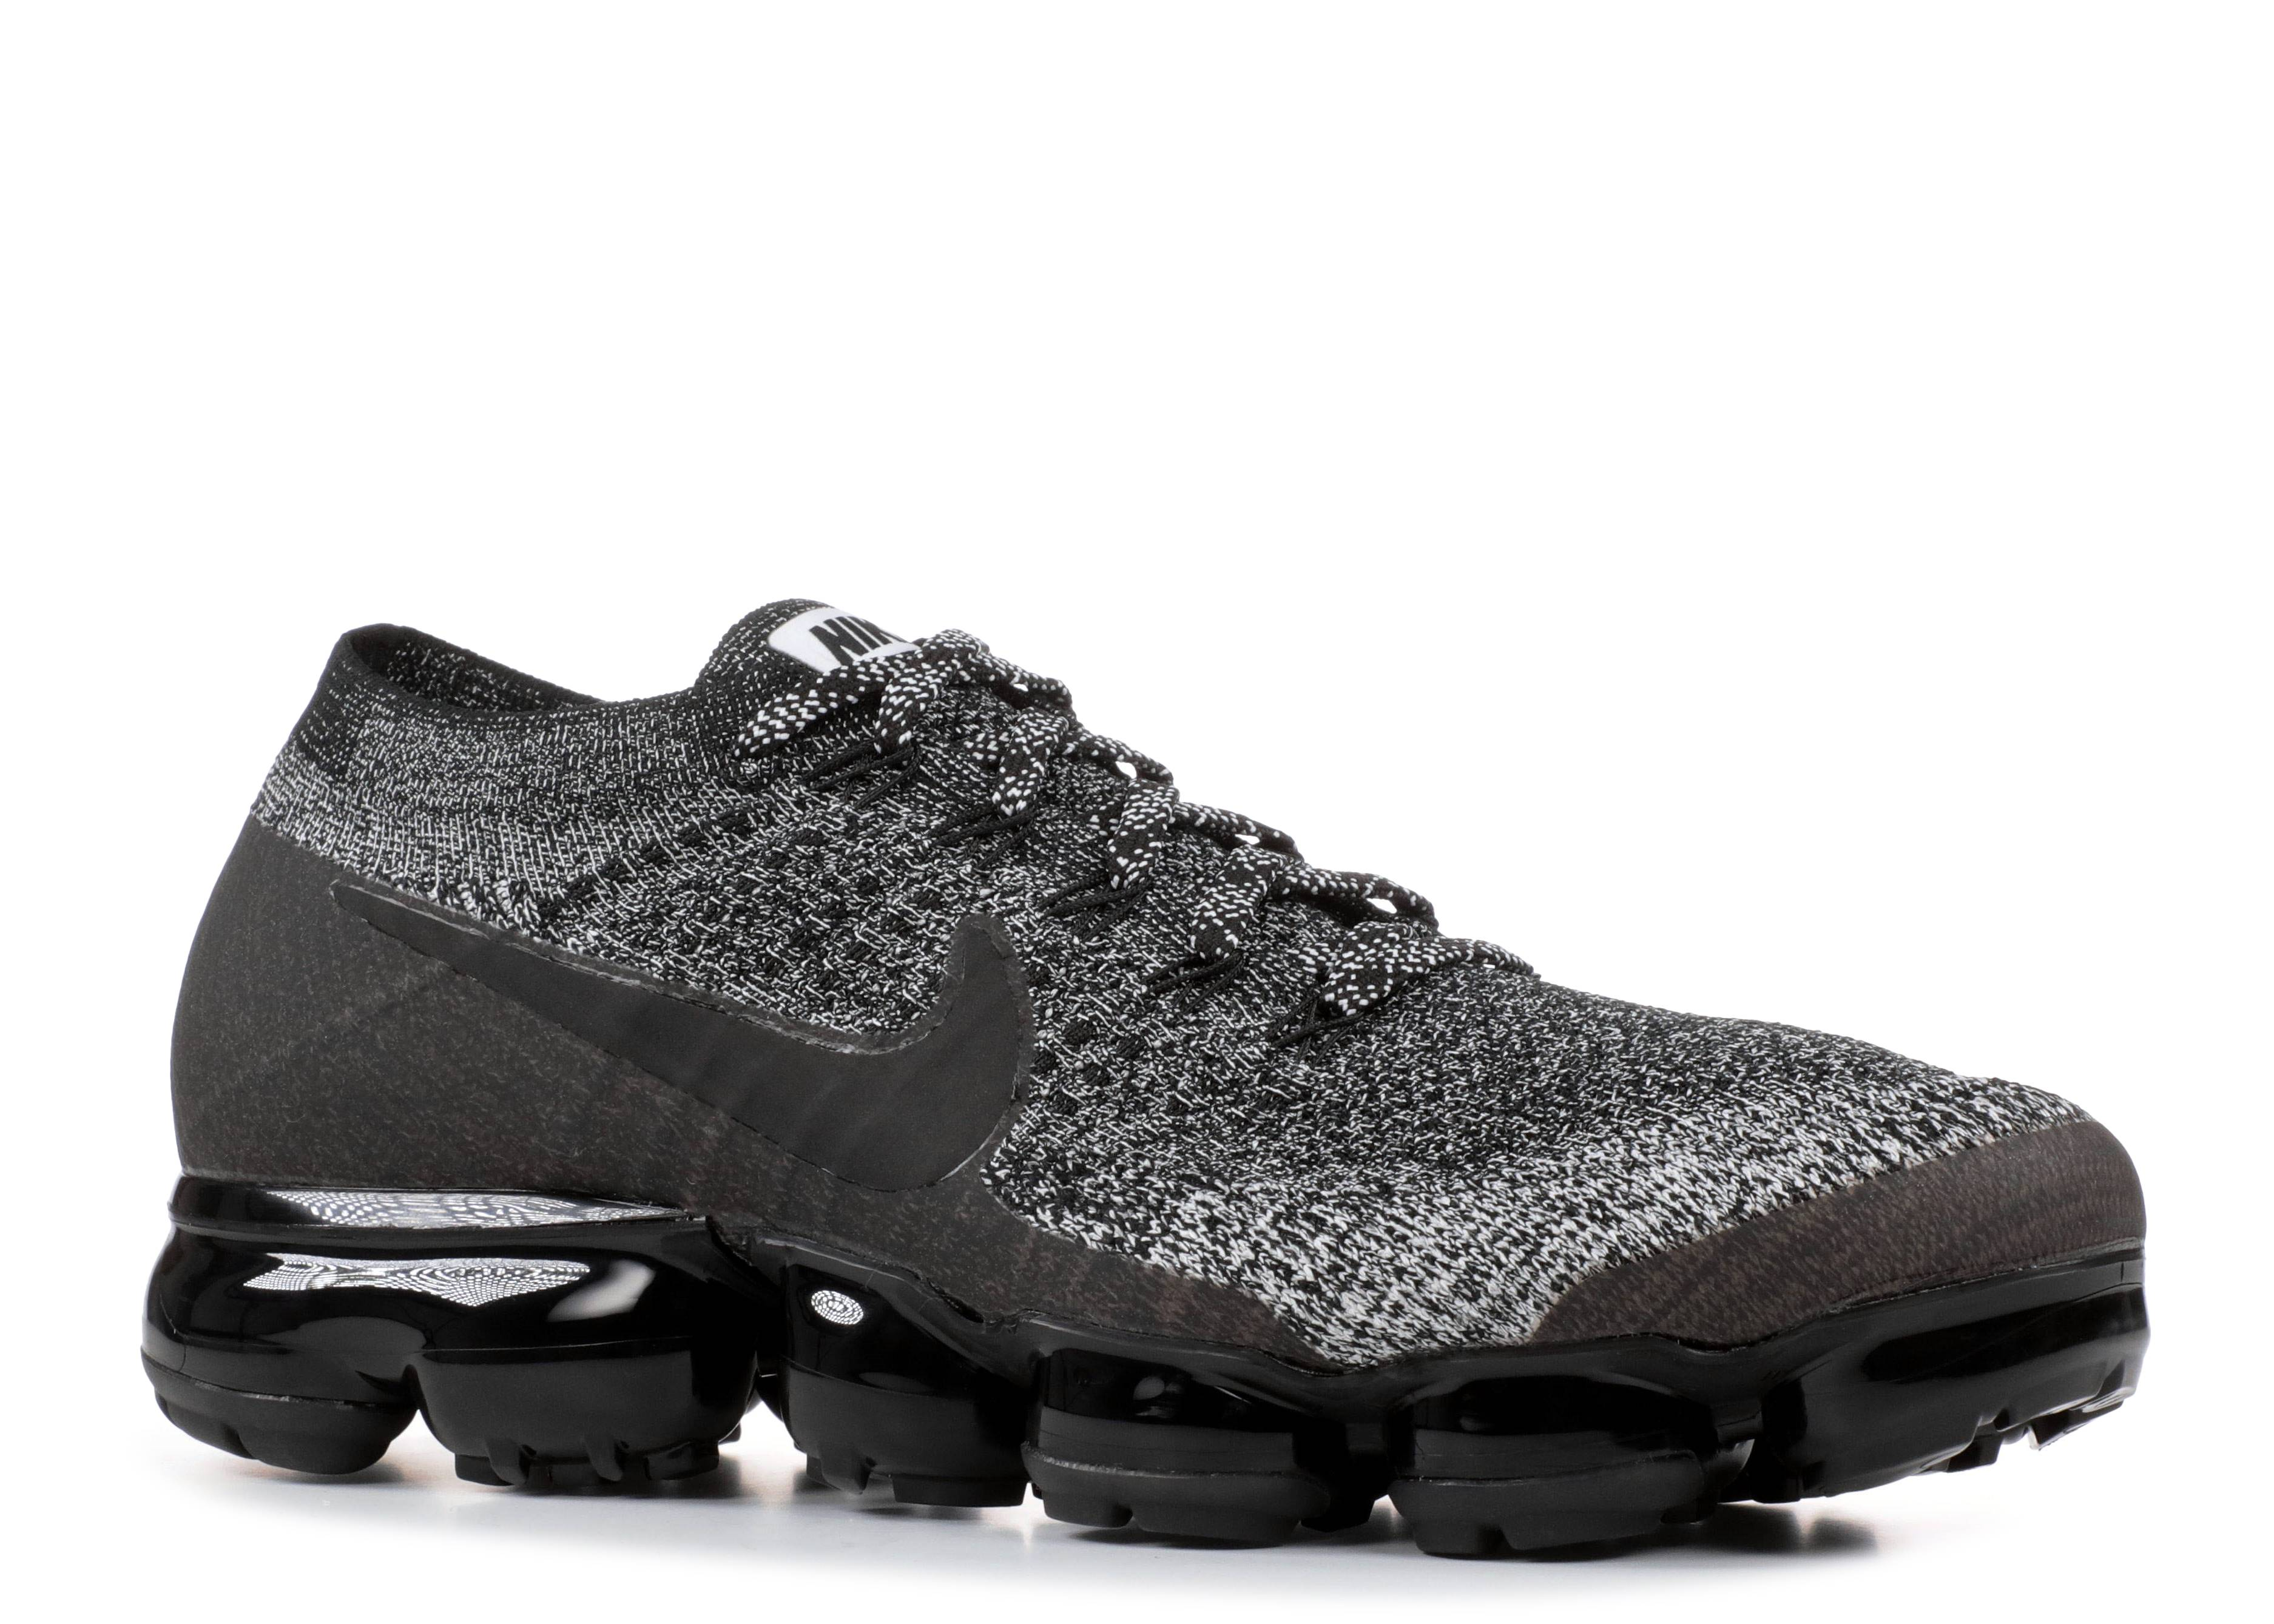 Nike Air VaporMax 2.0 Oreo 849558 041  849558 041